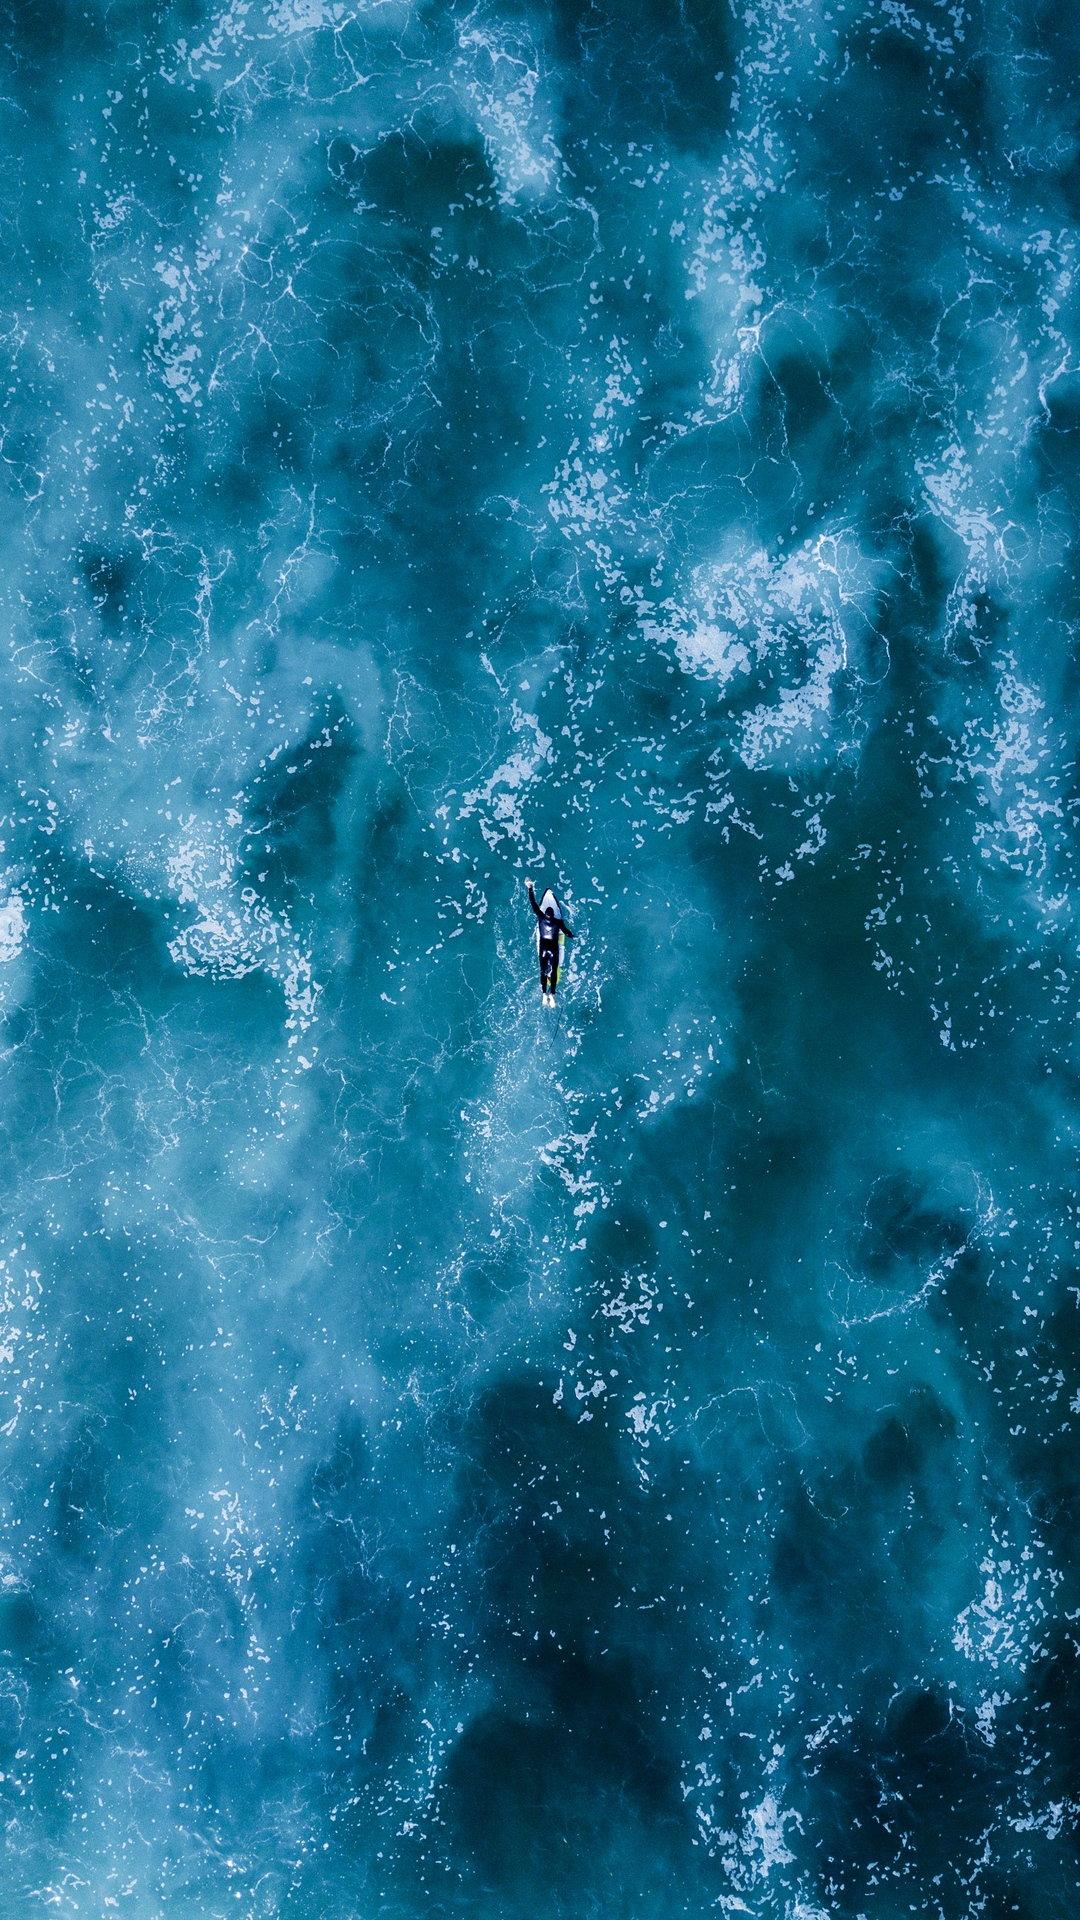 Iphone Lock Screen Wallpaper Slideshow Surfing Ocean Waves Wallpaper 1080x1920